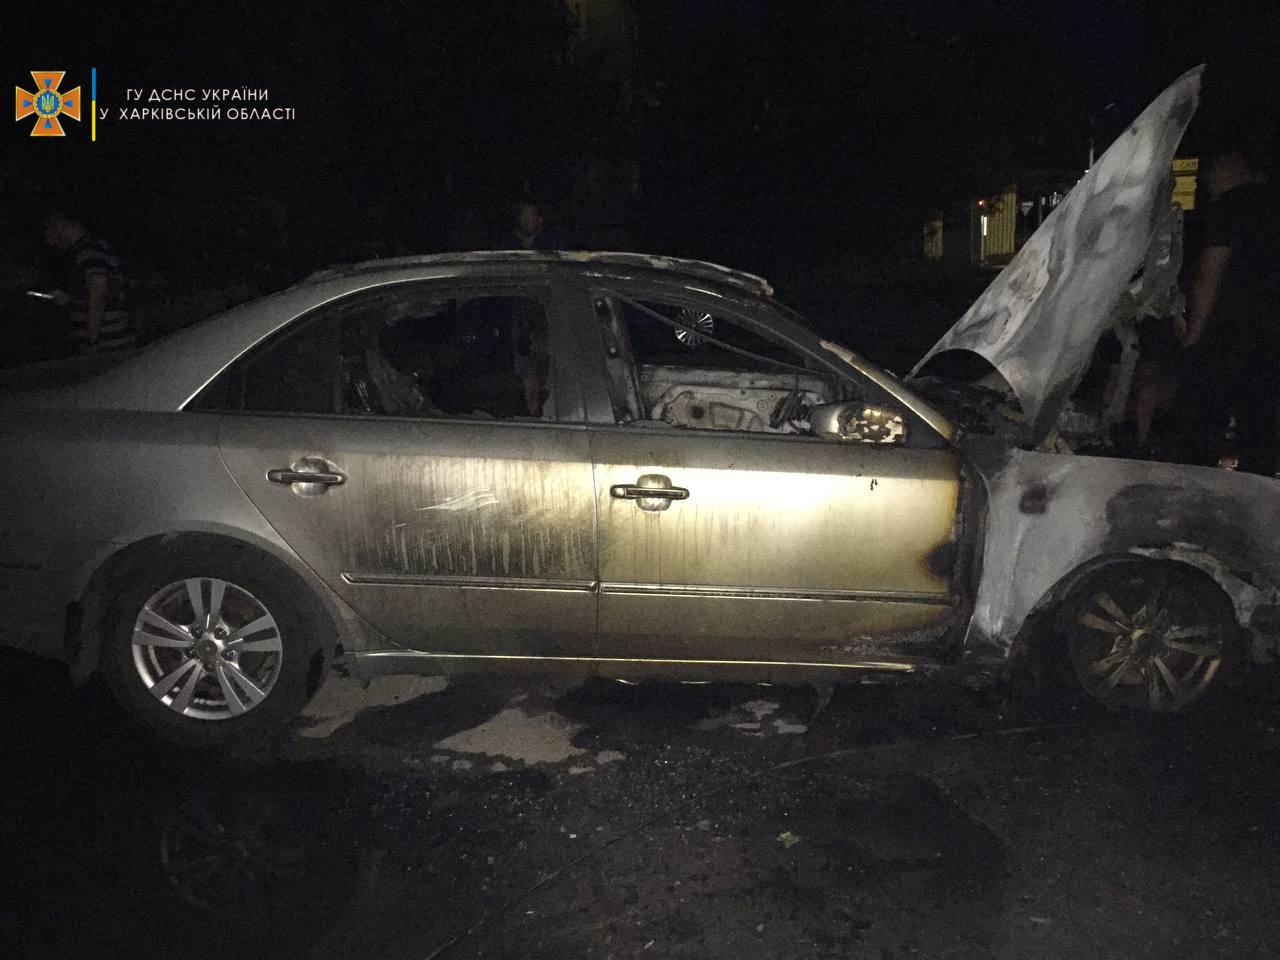 Ночью на Алексеевке подожгли два авто, - ФОТО, фото-2